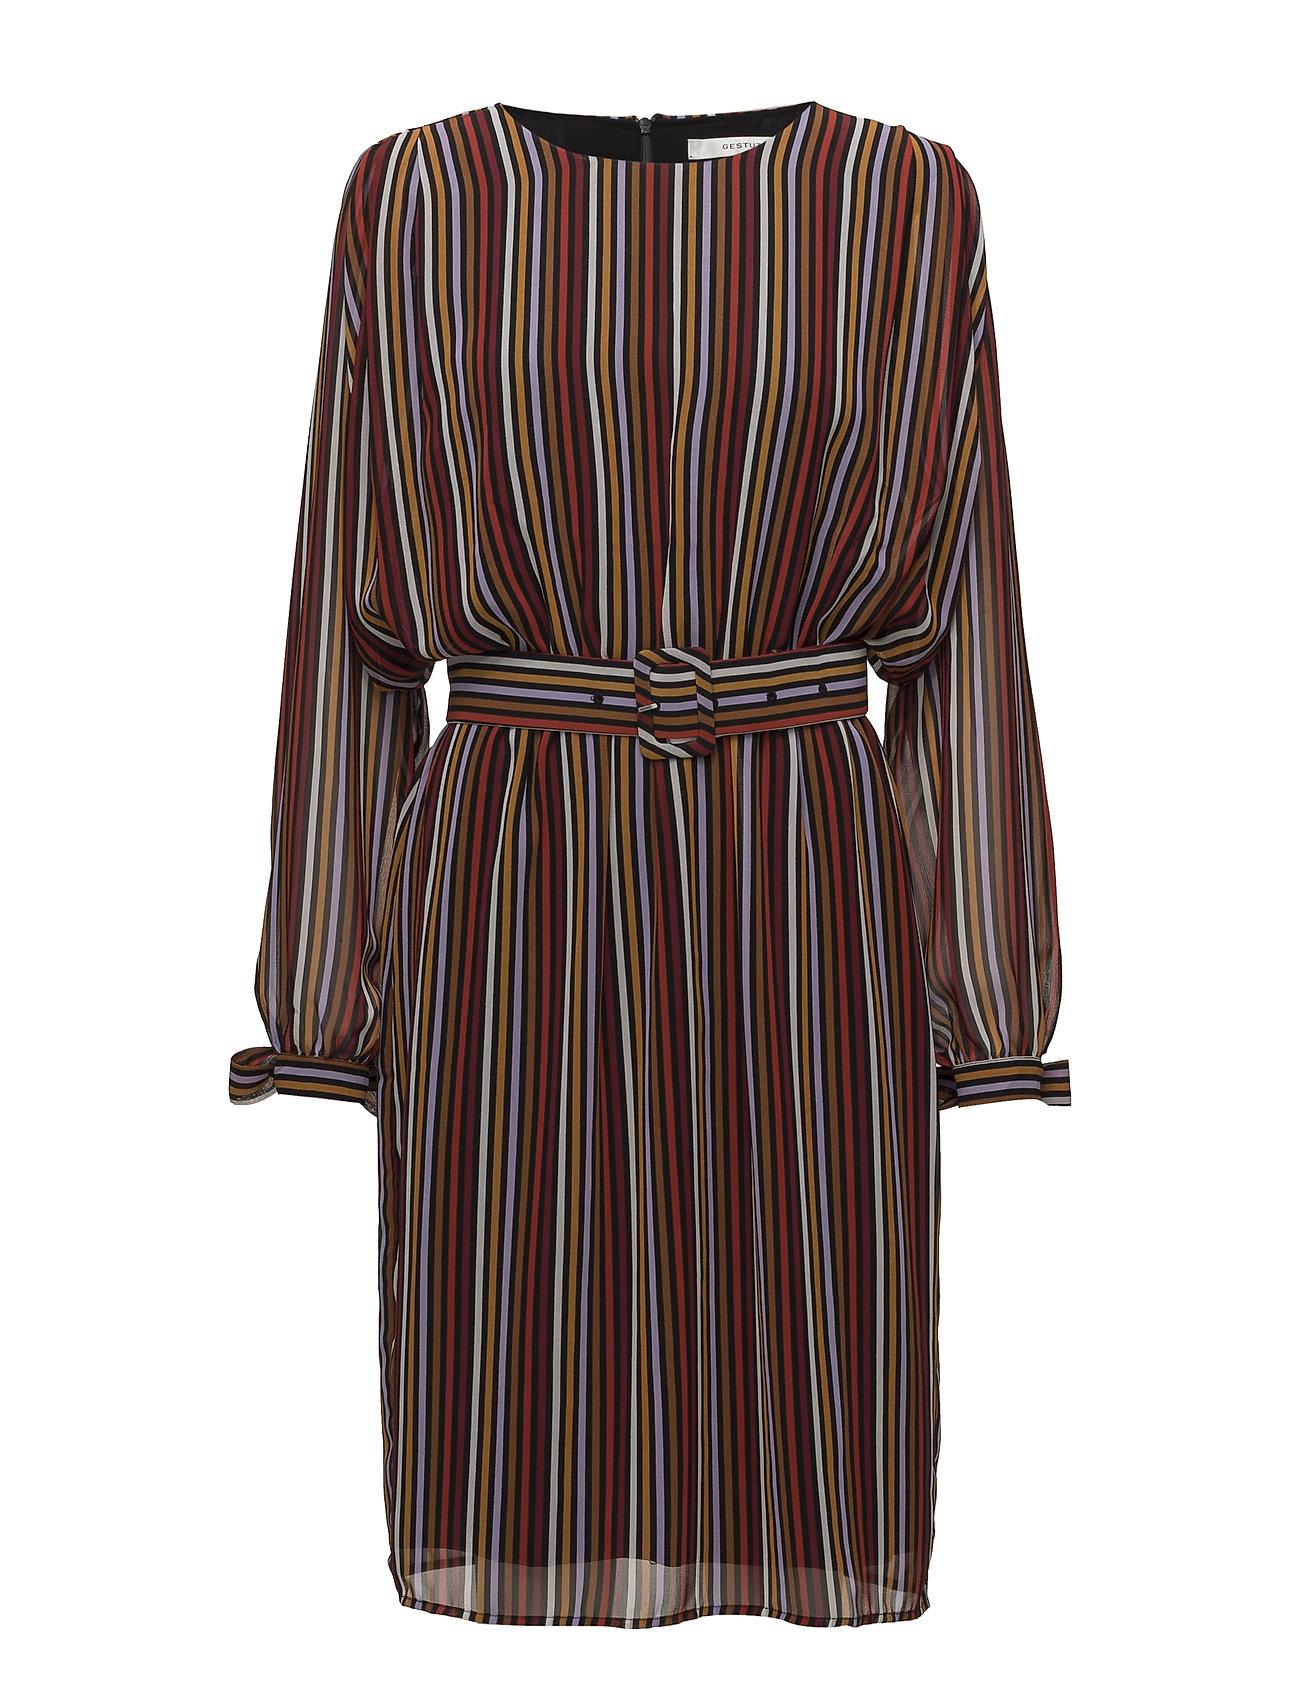 Gestuz Riba dress MA18 - RED STRIBE